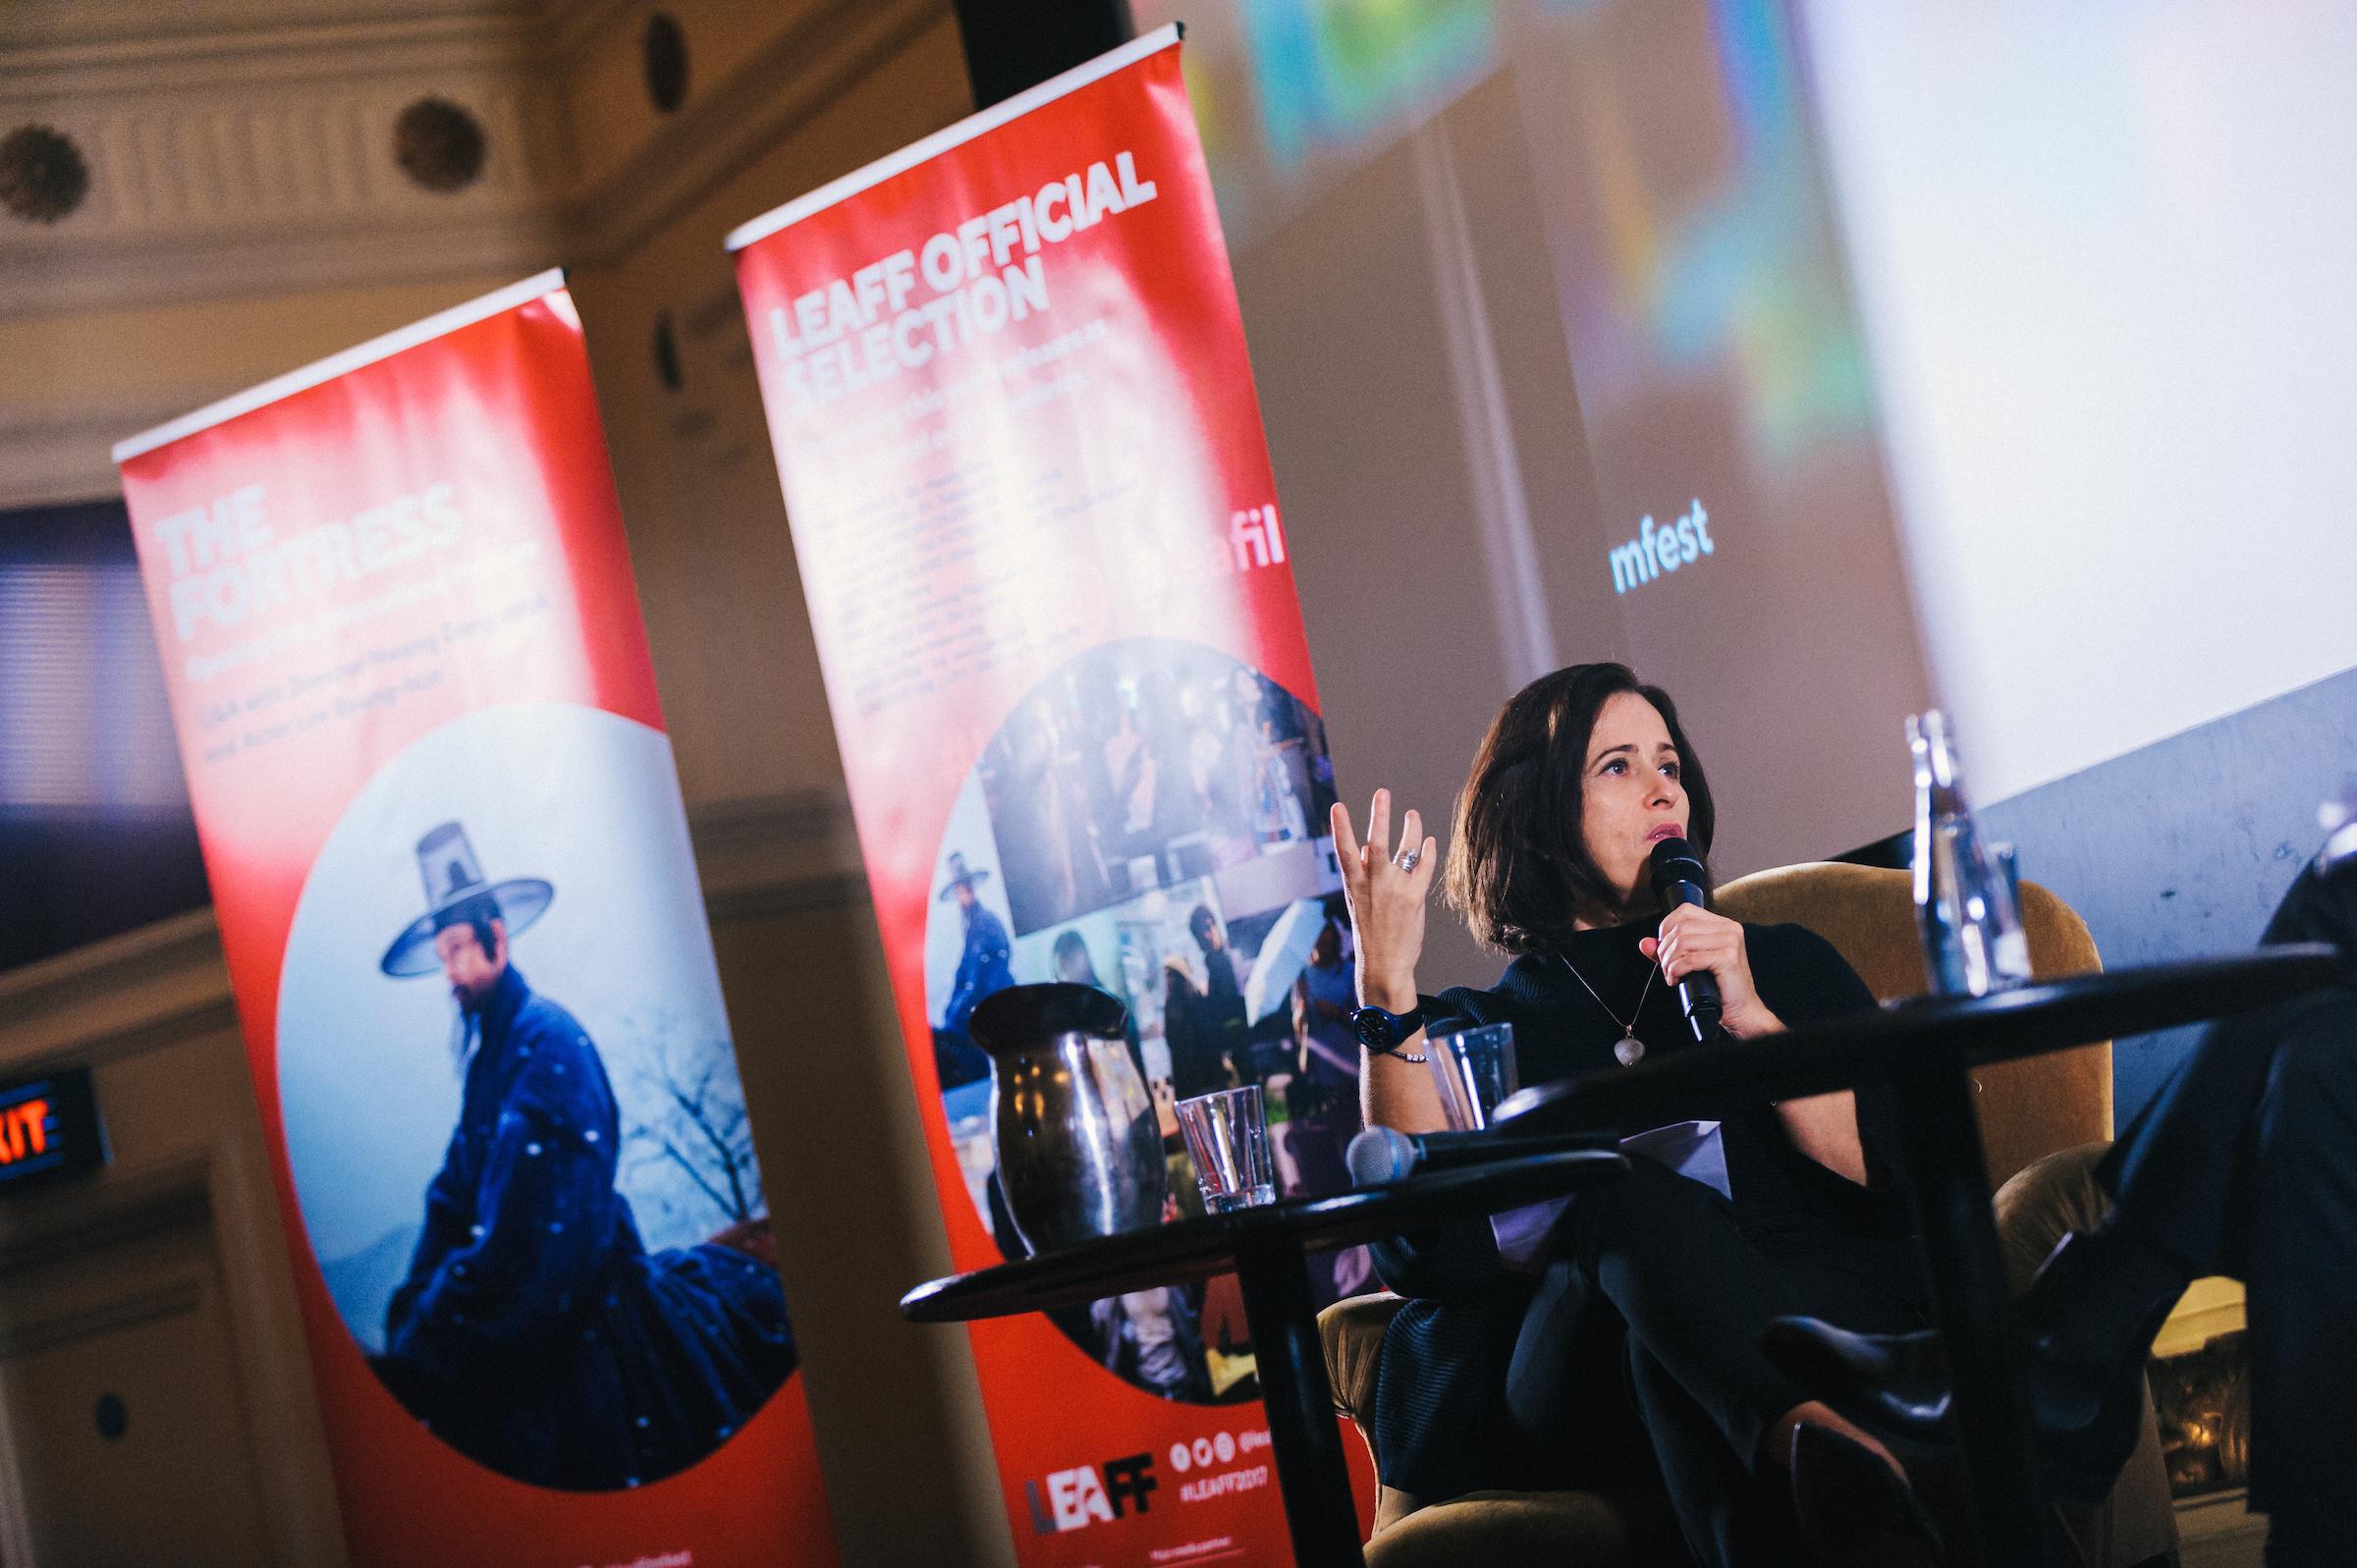 FUTURE TALENT TALK   In partnership with Film London